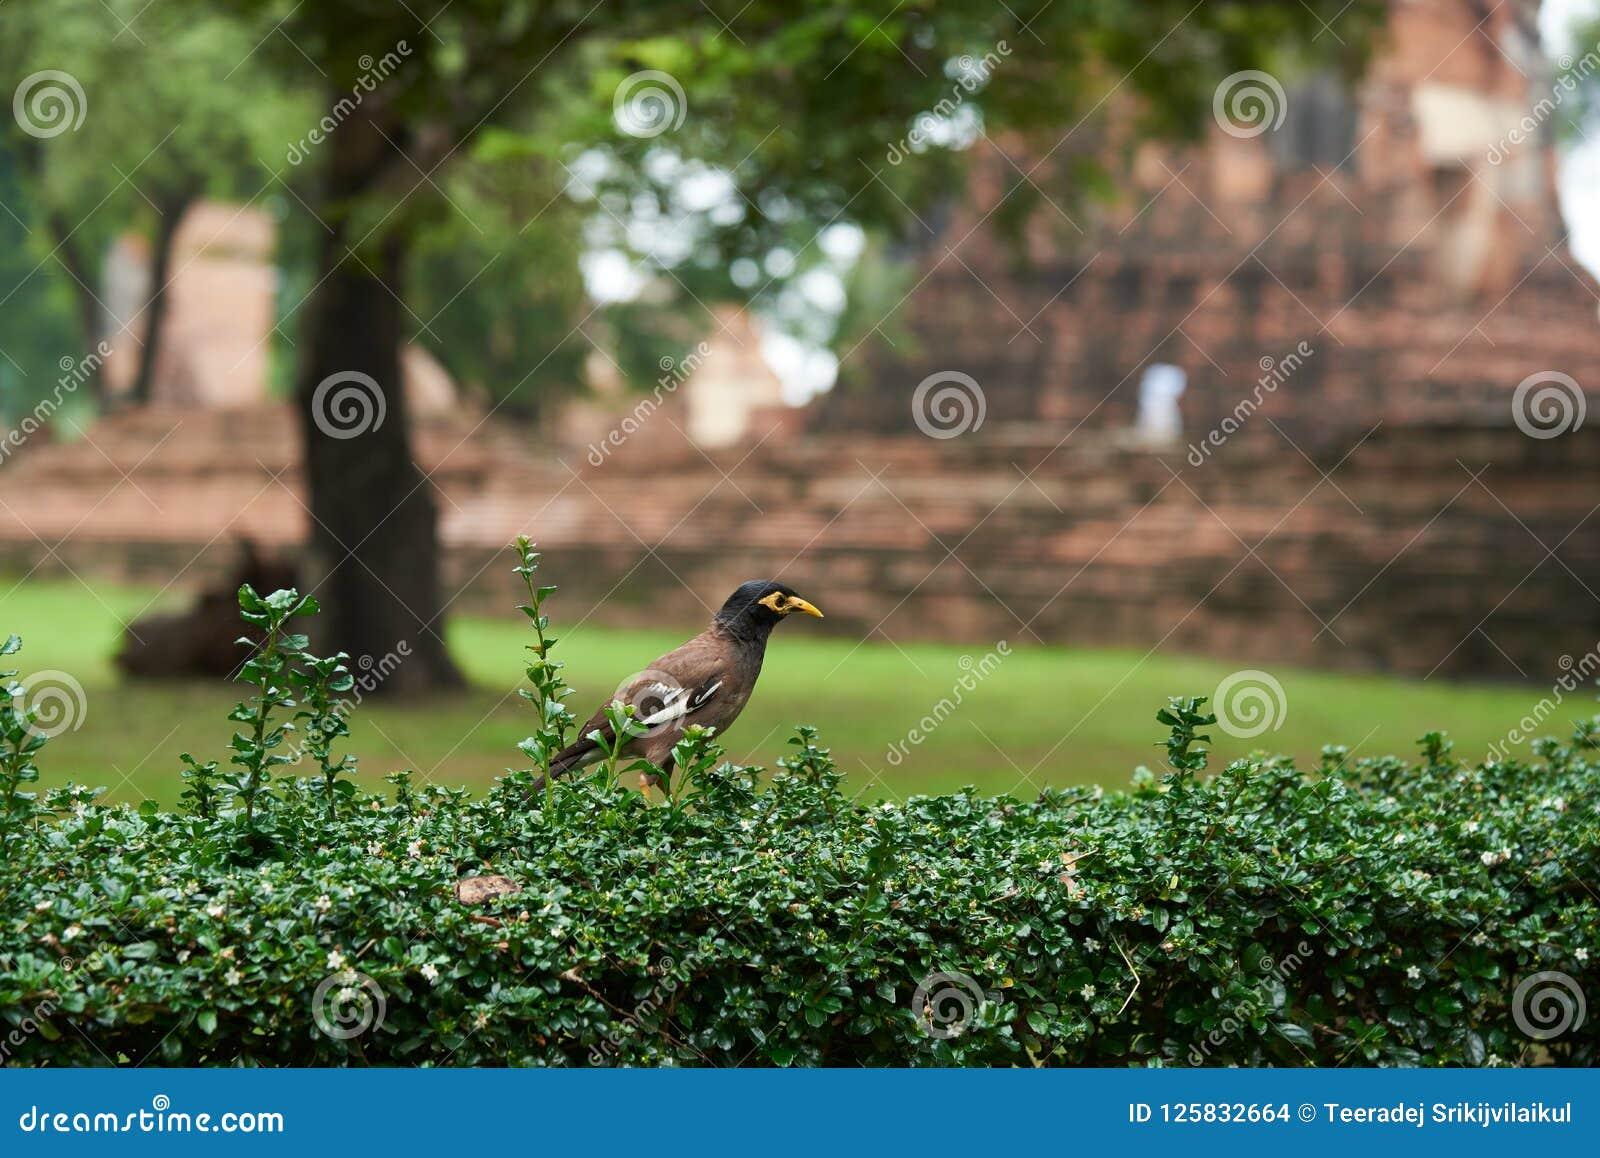 A myna bird standing on the green bush